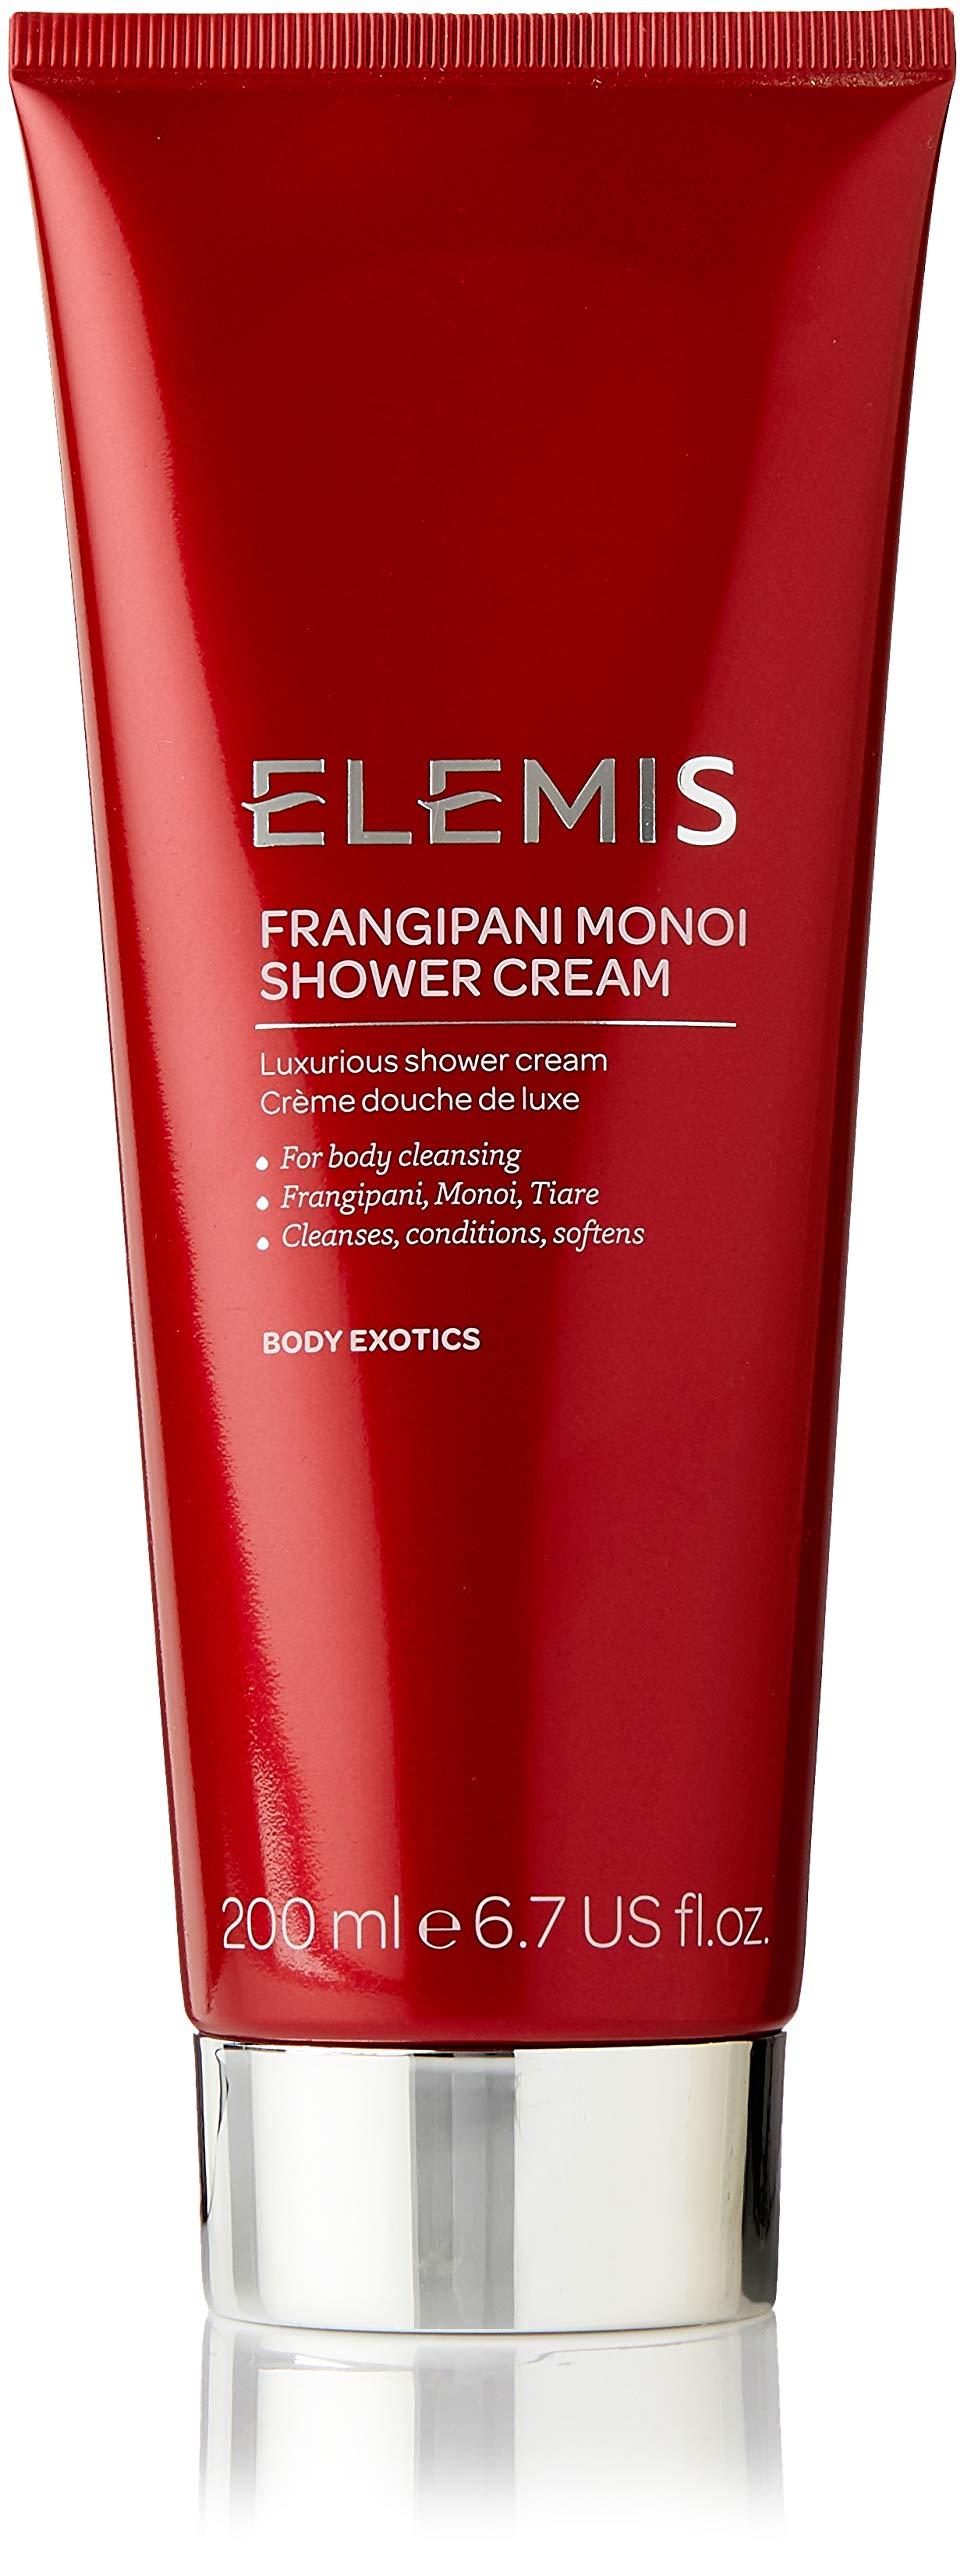 ELEMIS Frangipani Monoi Shower Cream - Luxurious Shower Cream, 6.7 fl. oz.